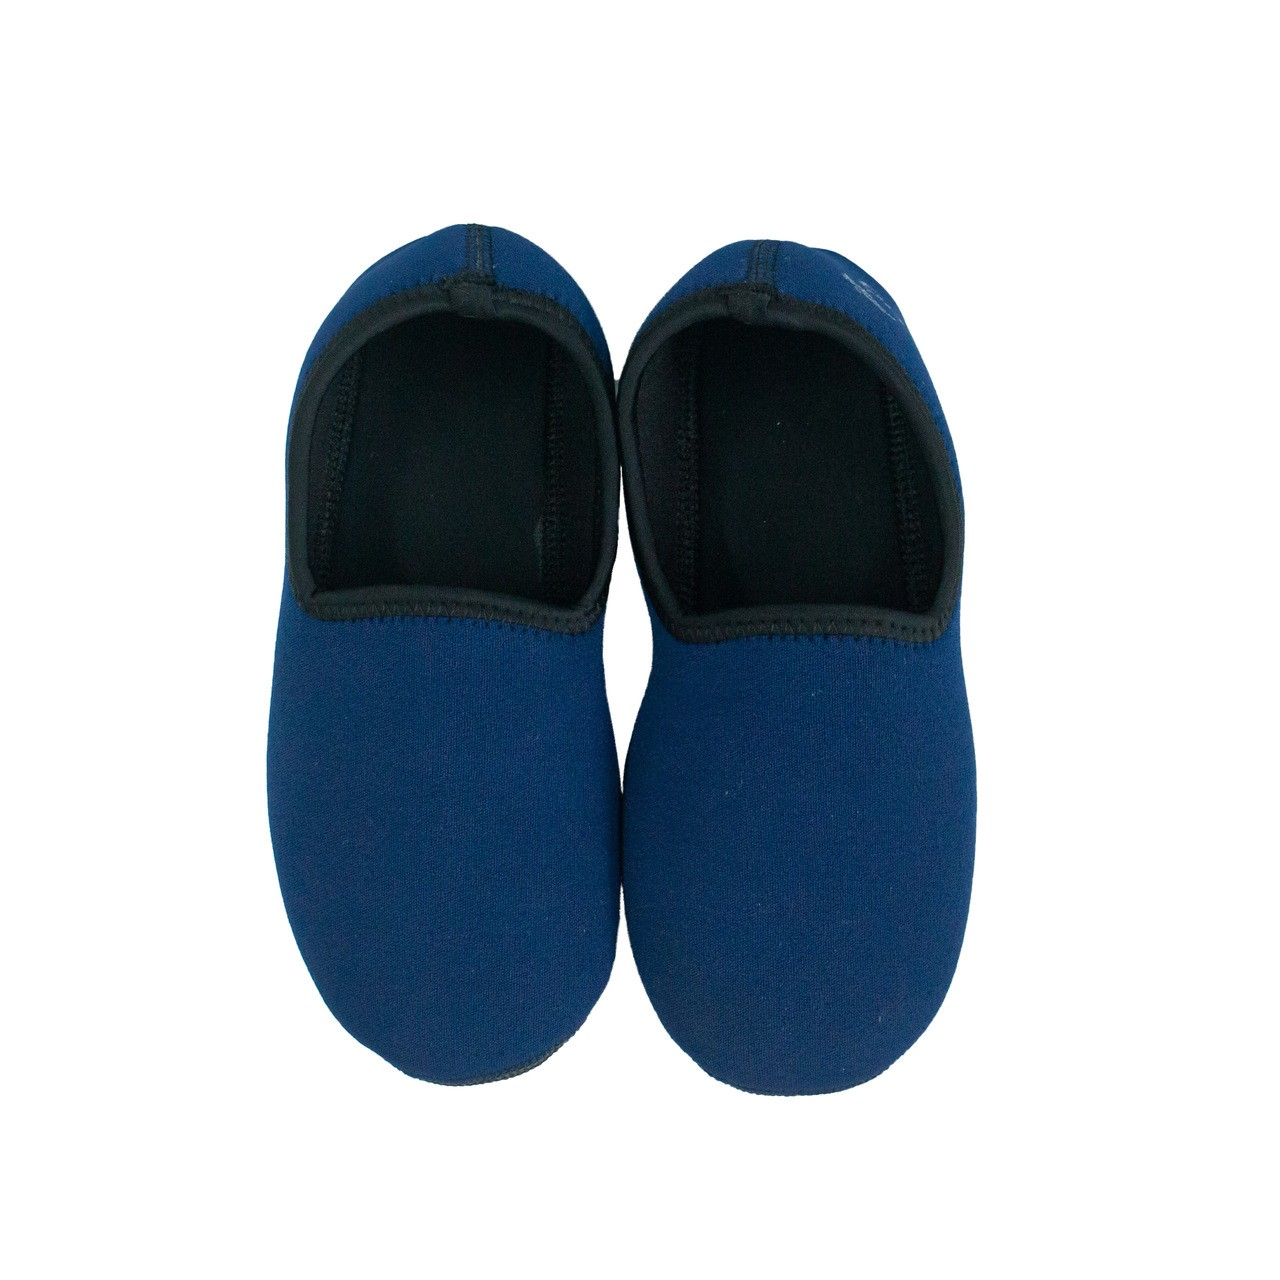 Ufrog Adulto Fit Azul Marinho